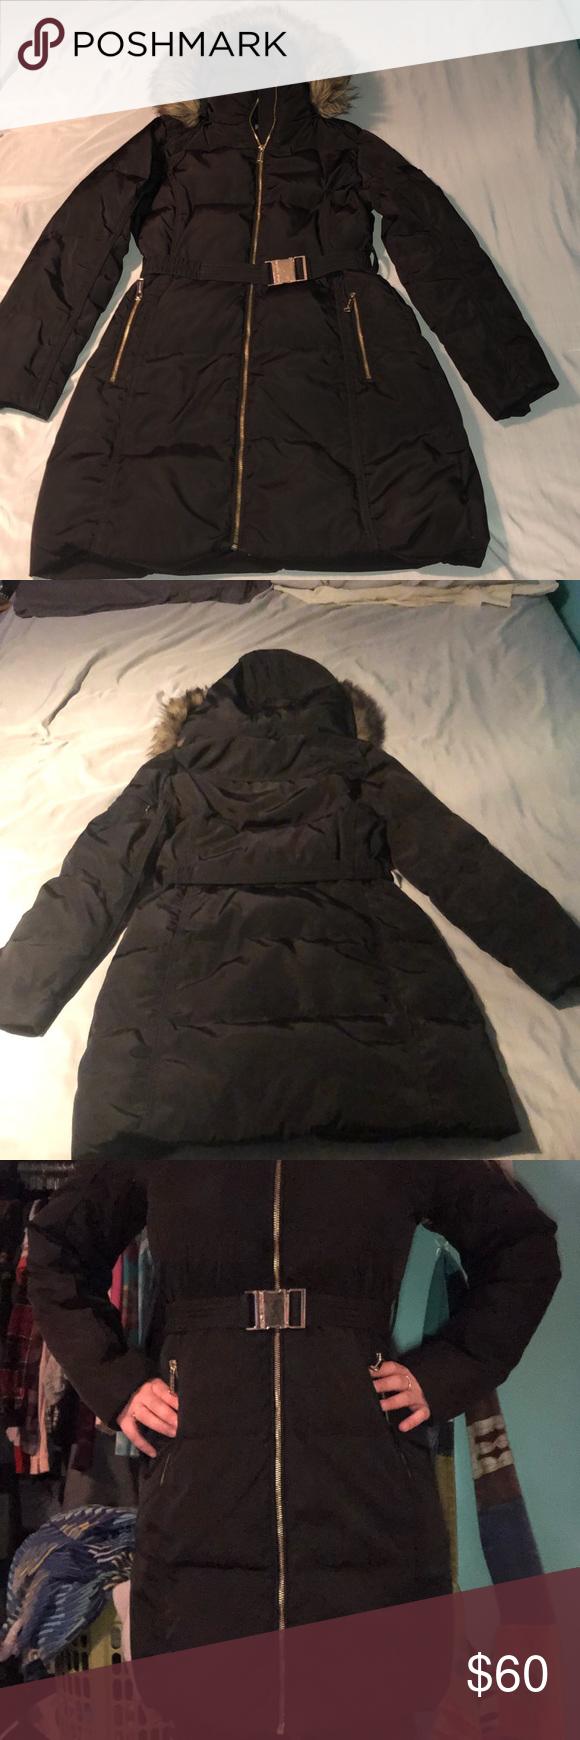 Woman Coats womans puffer coat with fur hood